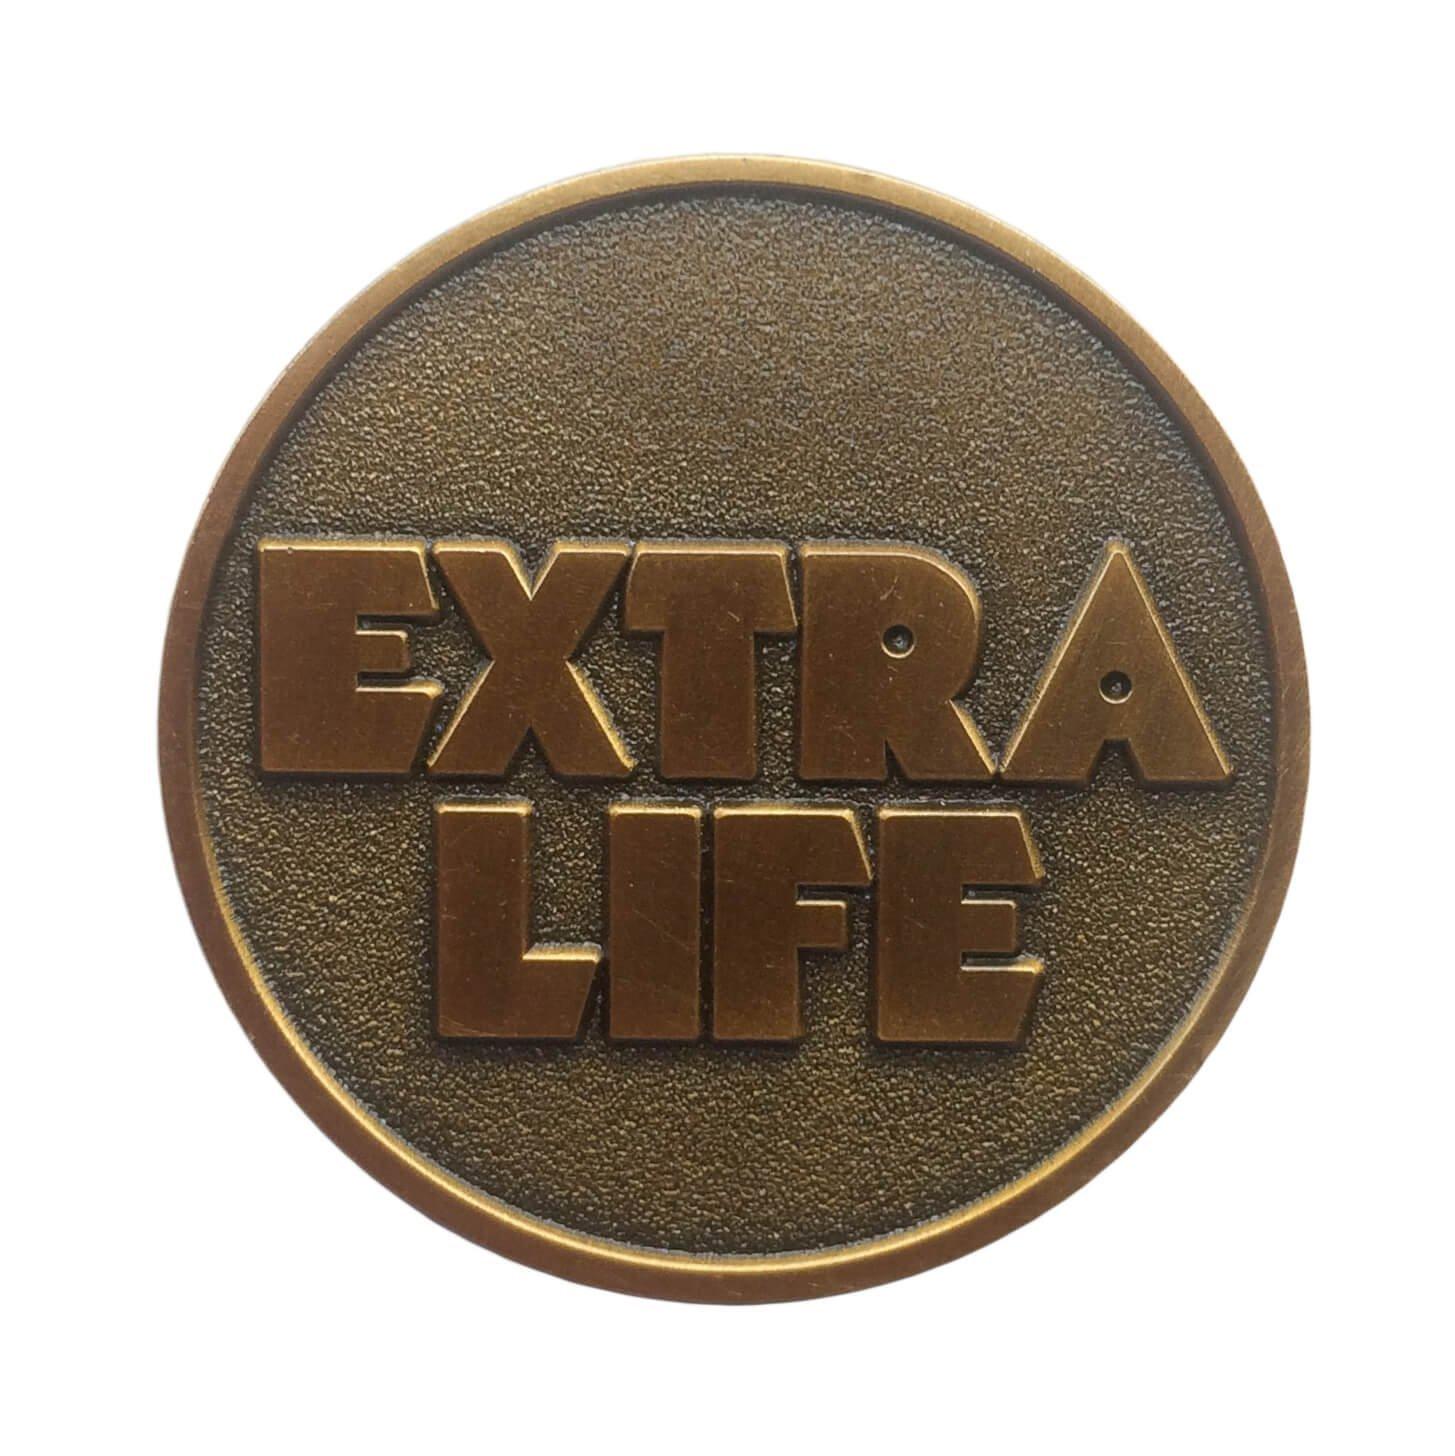 extra-life-coin